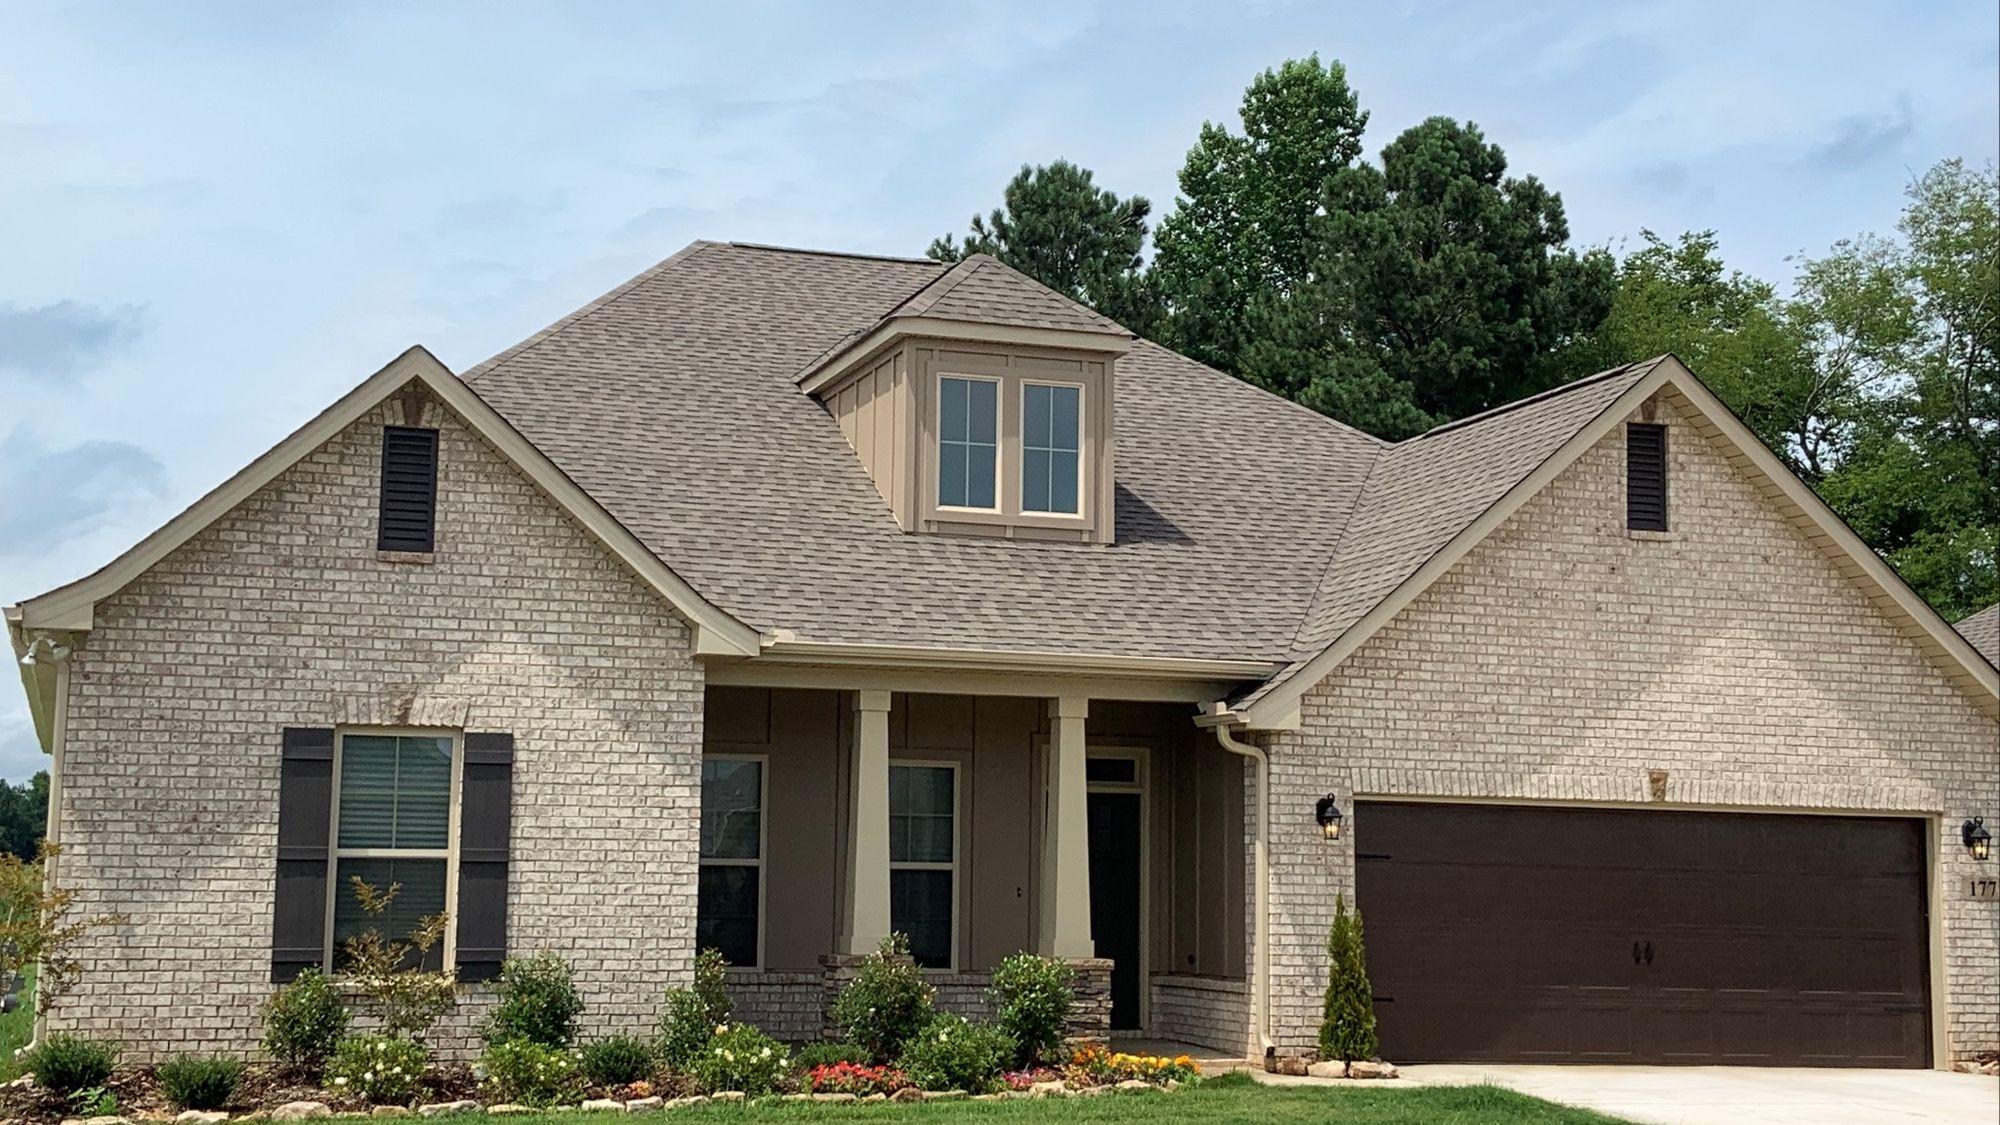 Colebrook II A - DSLD Homes - Meridianville, AL - Model Home Exterior